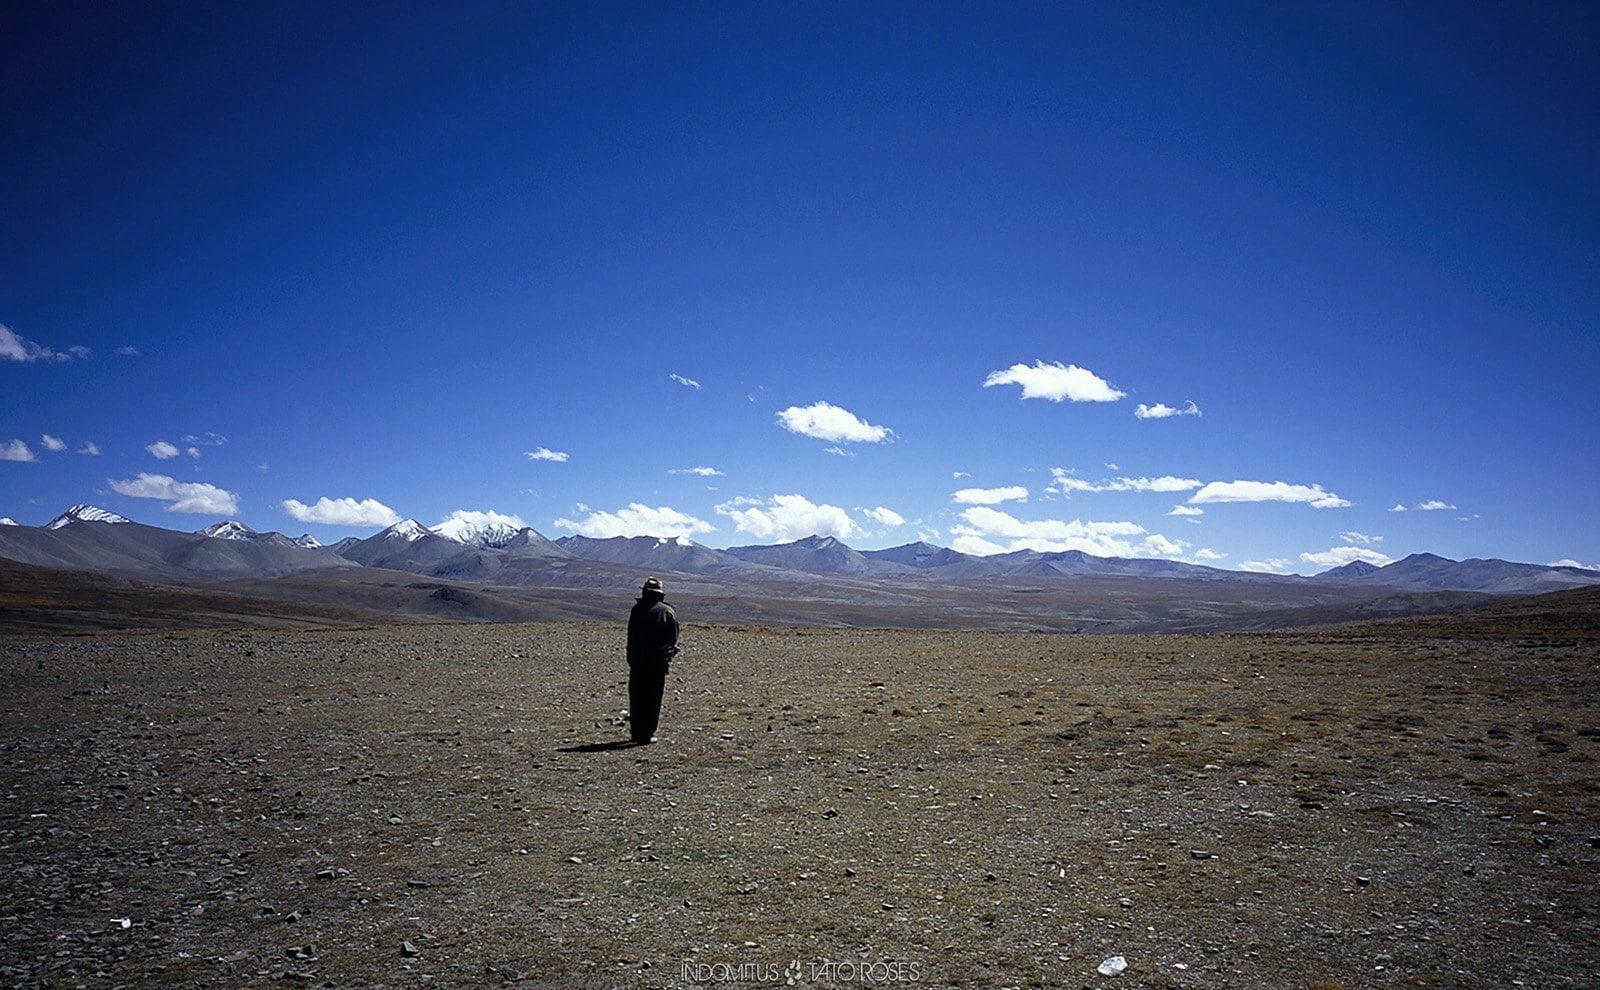 Tíbet Indomitus Tato Rosés 21